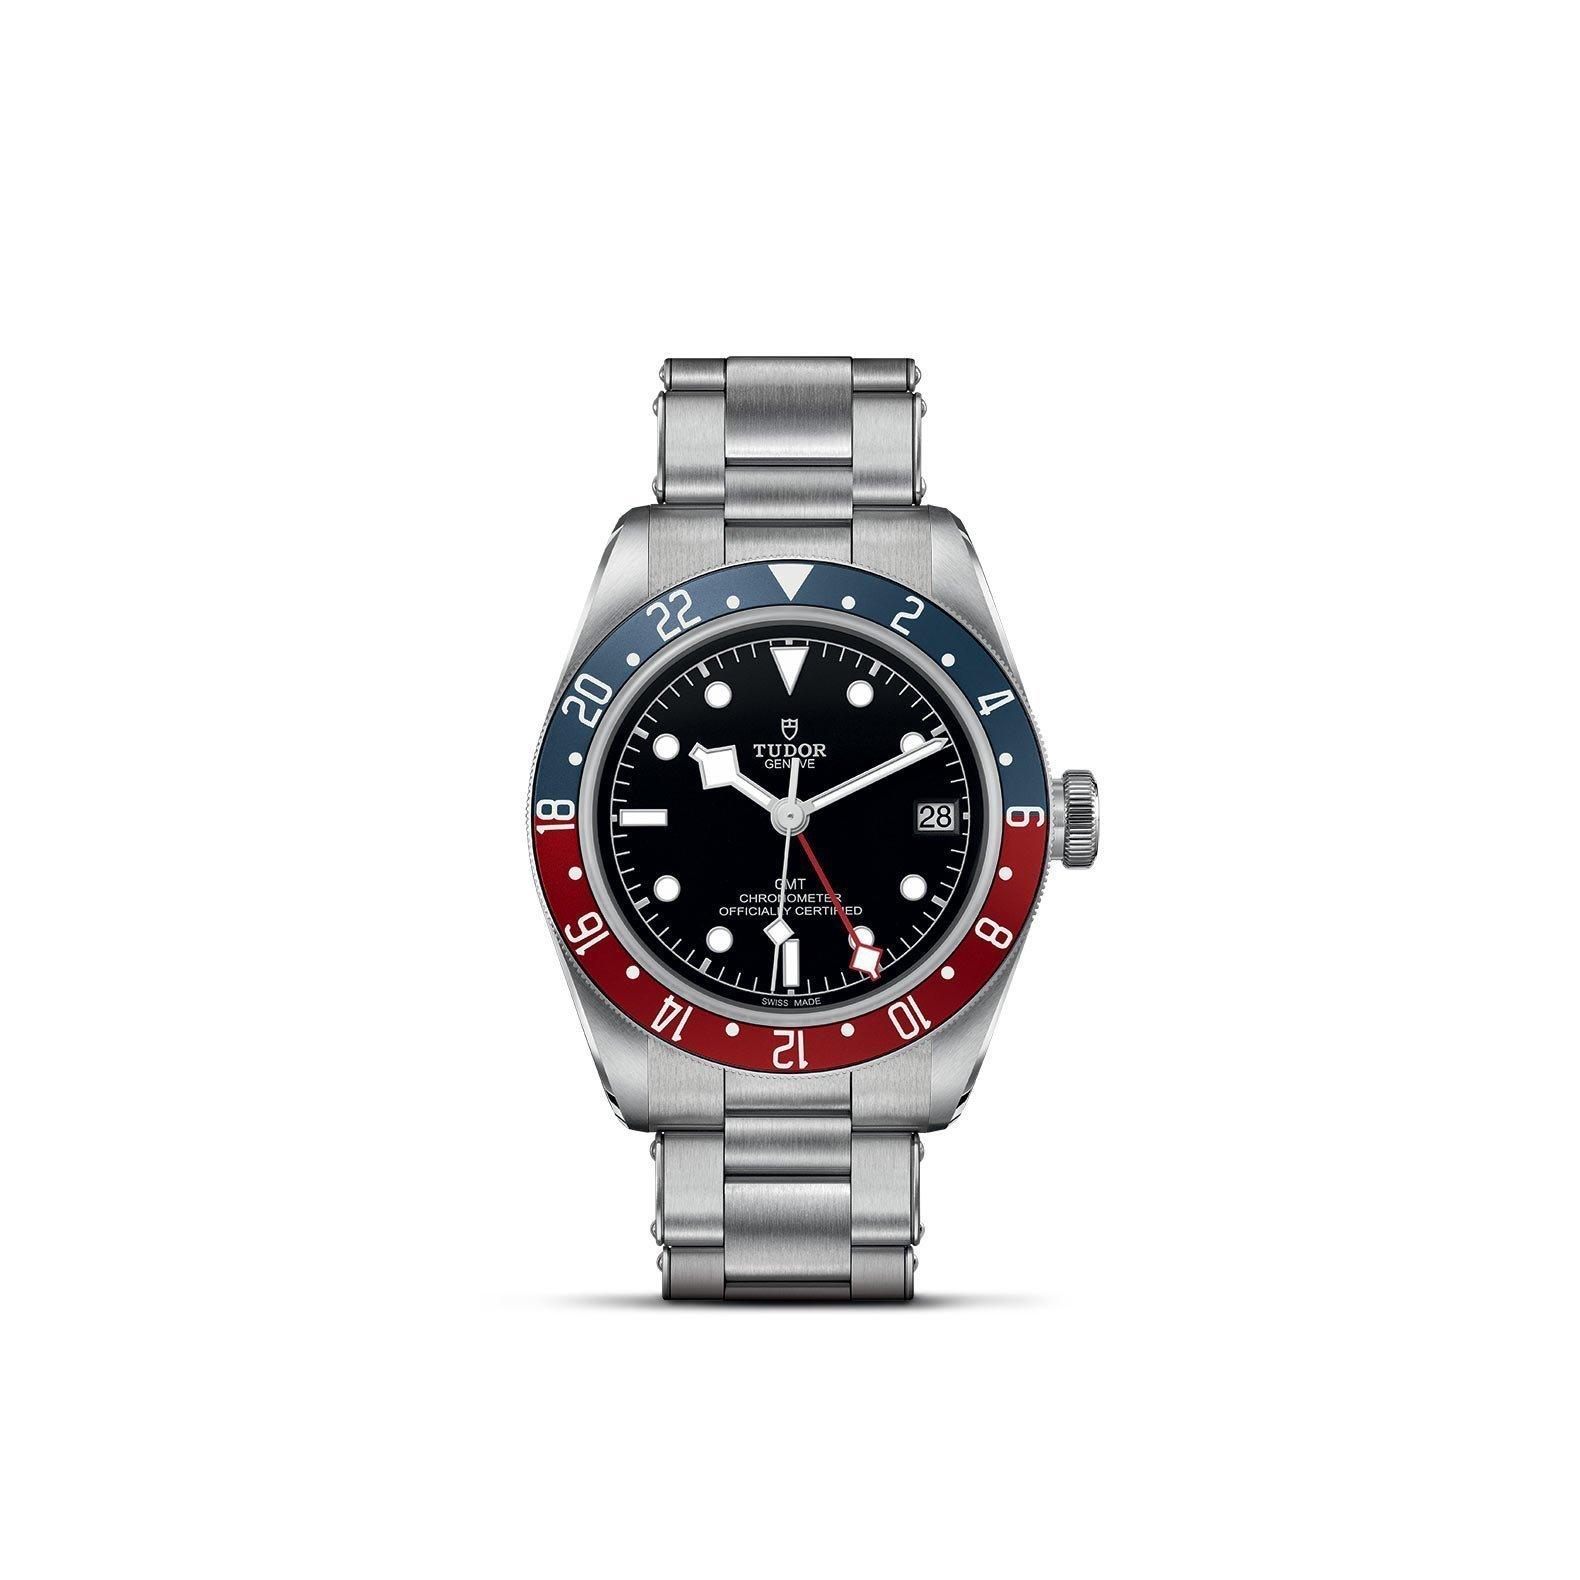 Montre TUDOR Black Bay GMT boîtier en acier, 41mm, bracelet en acier vue 1